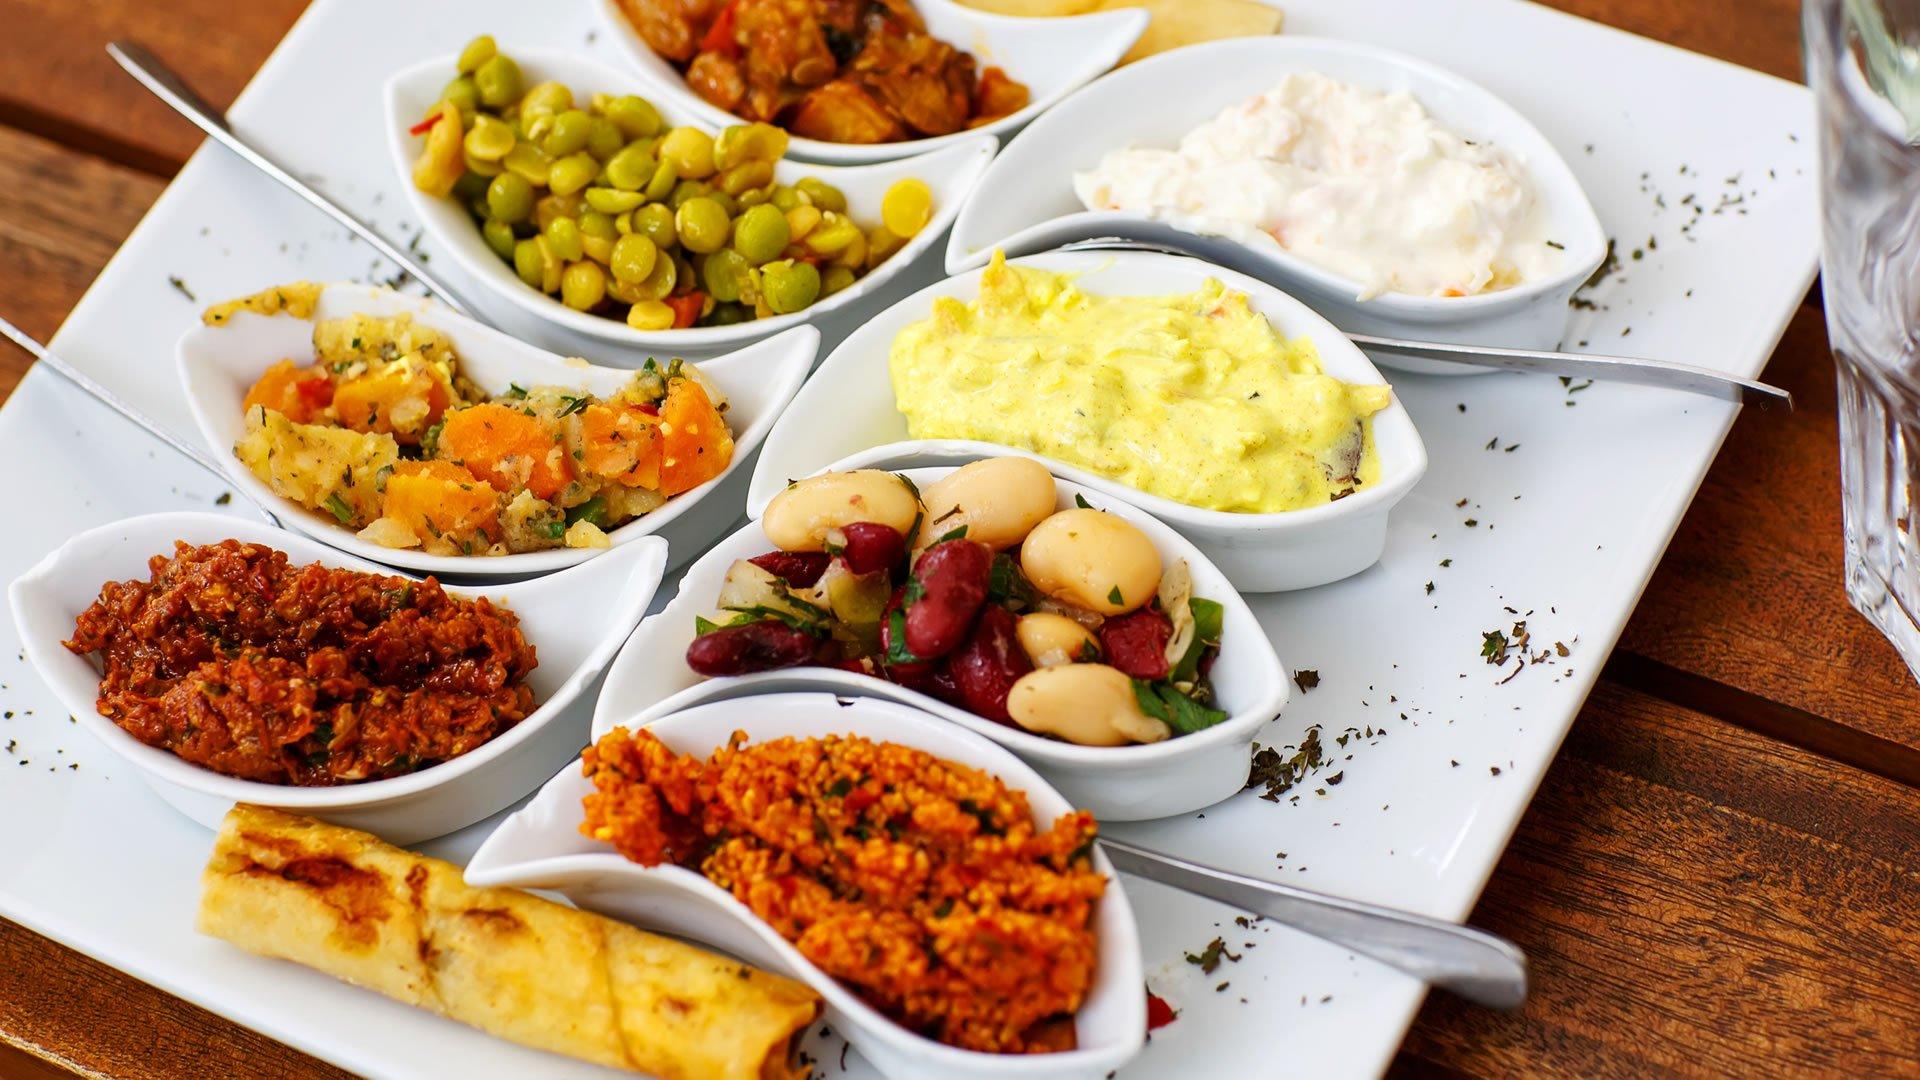 Comida t pica de grecia los mezzedes o aperitivos griegos for Aperitivos tipicos de francia